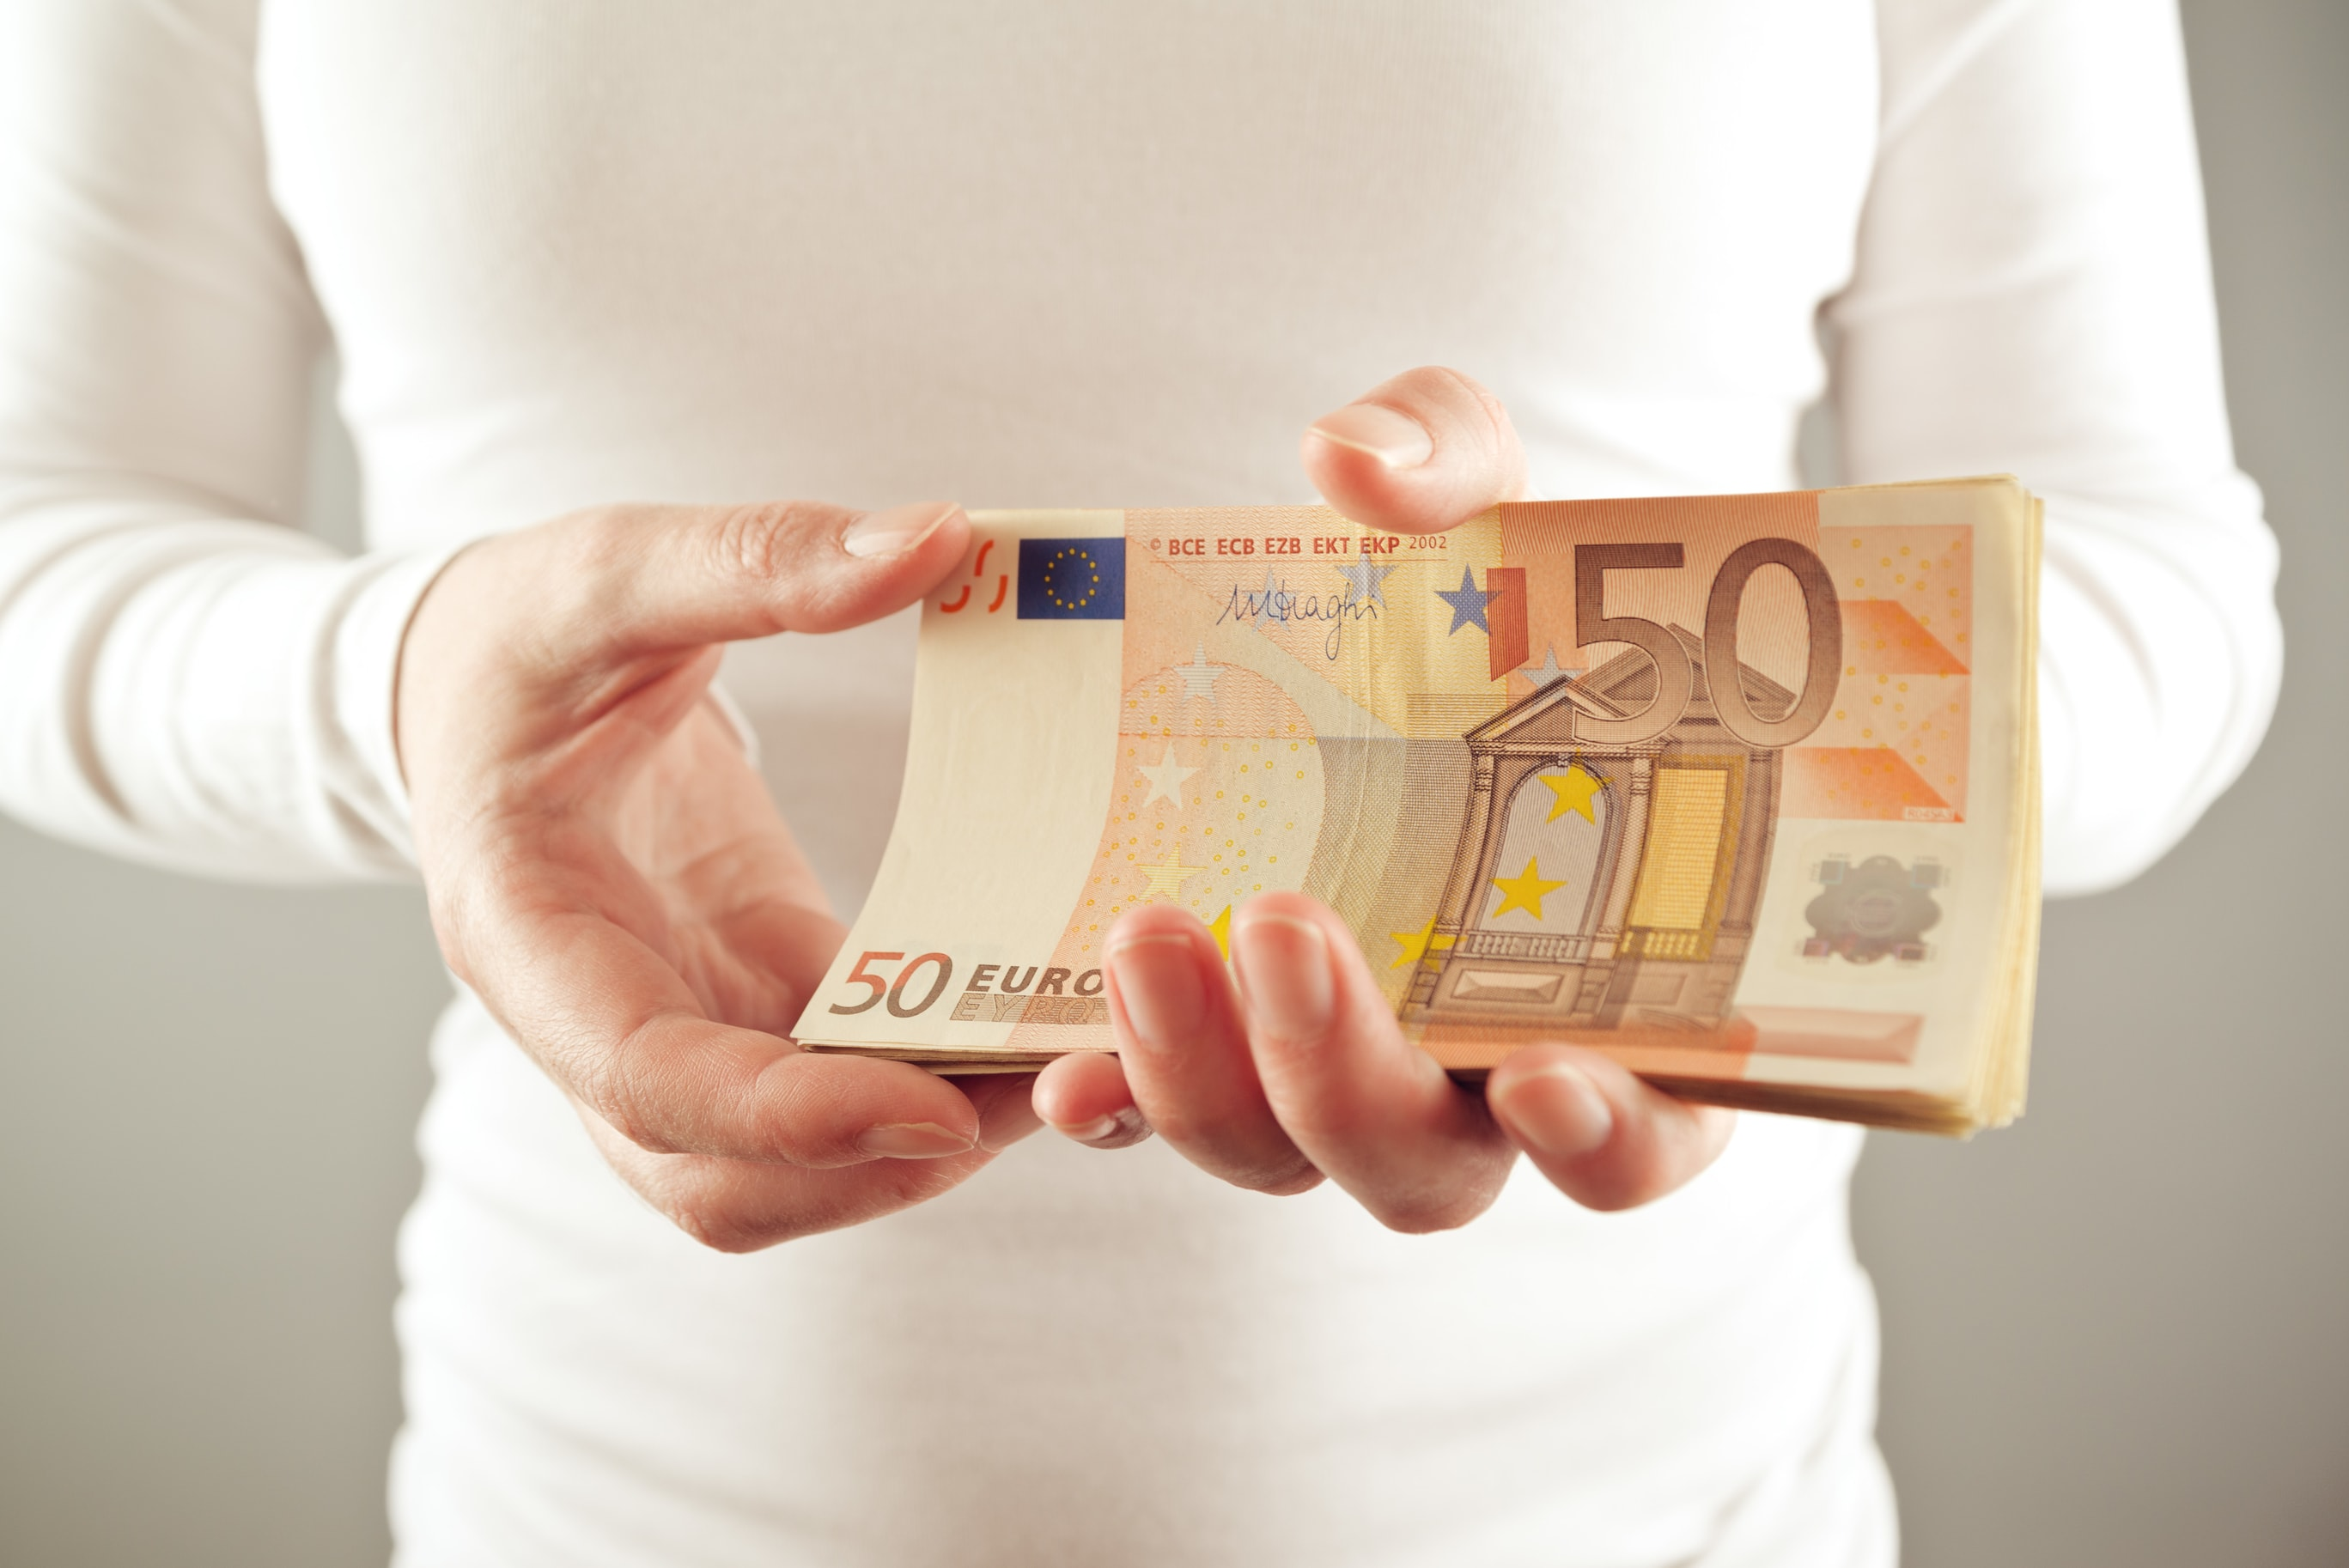 4finance Oy